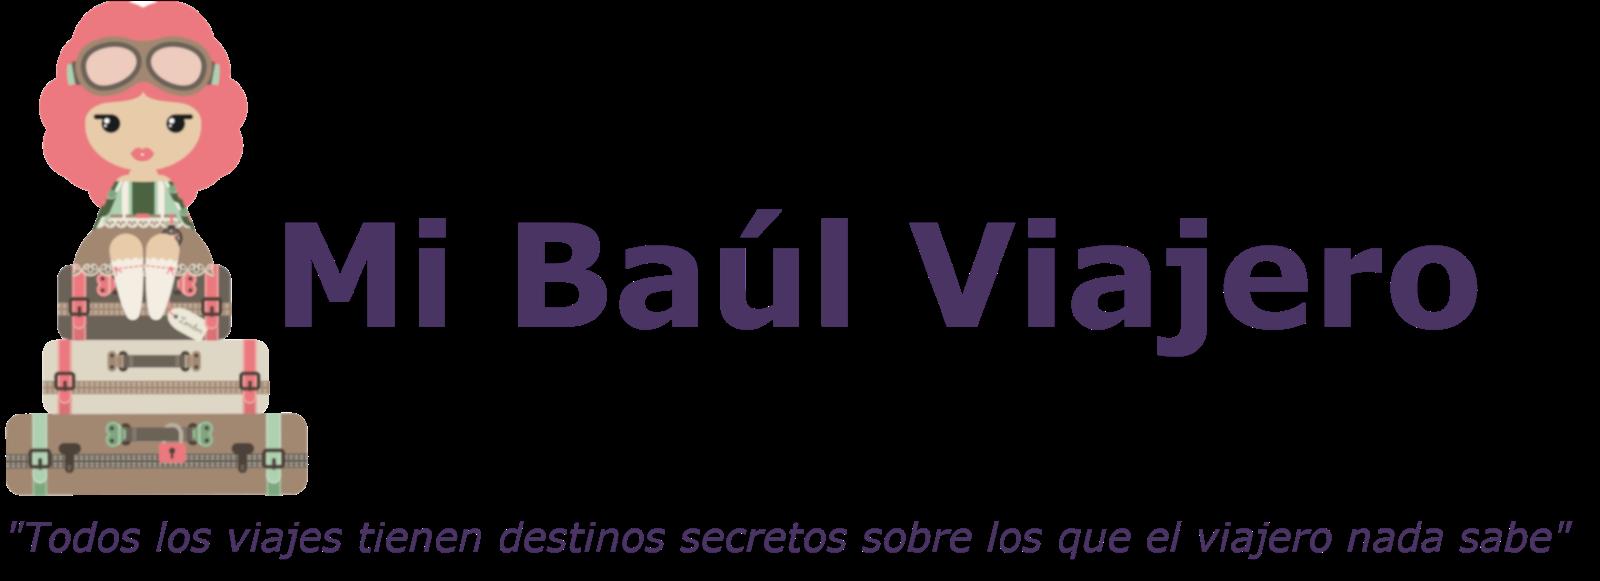 Mi Baúl viajero